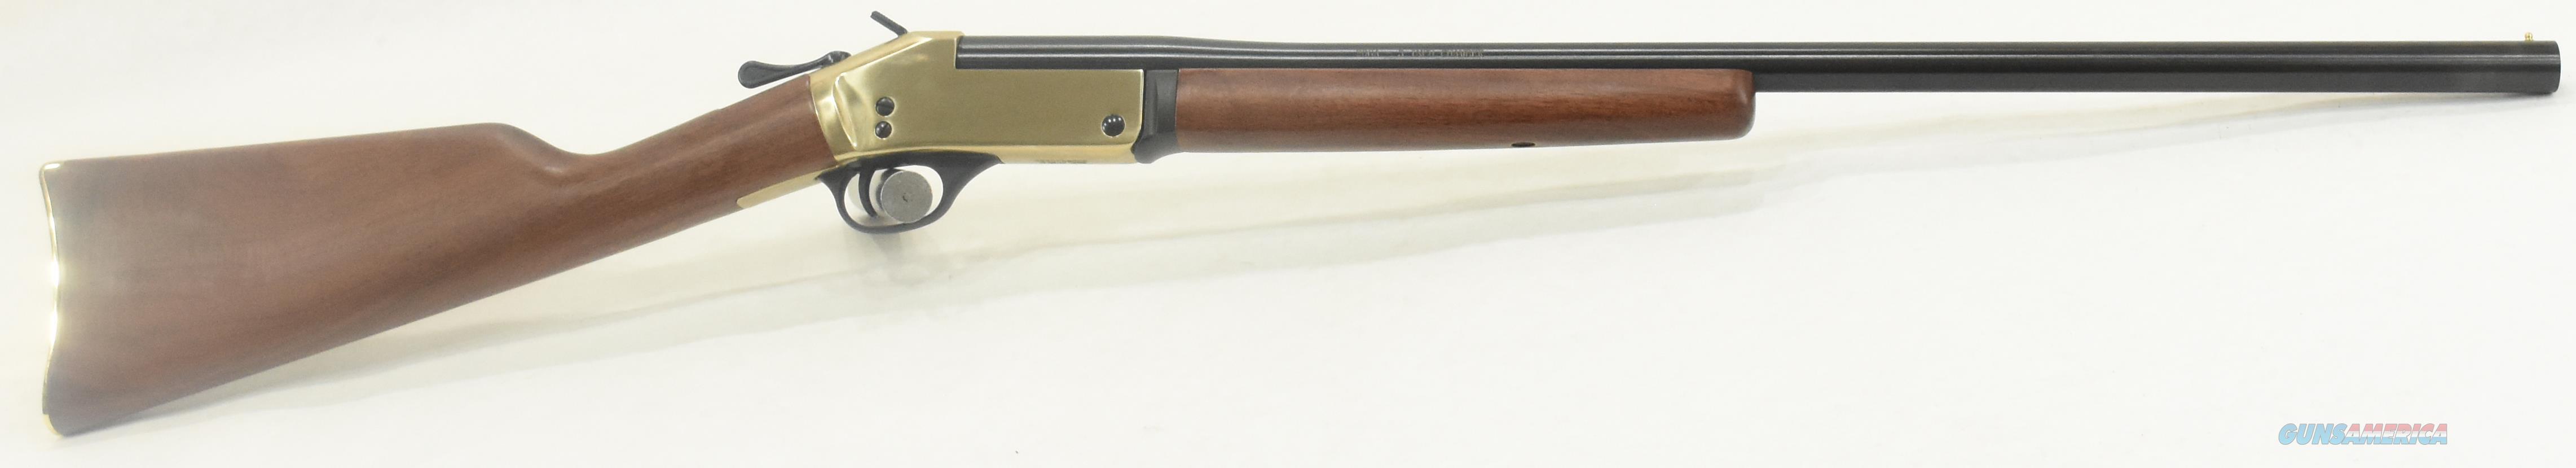 Singleshot Brass 20Ga 26In  H015B-20  Guns > Rifles > Henry Rifles - Replica